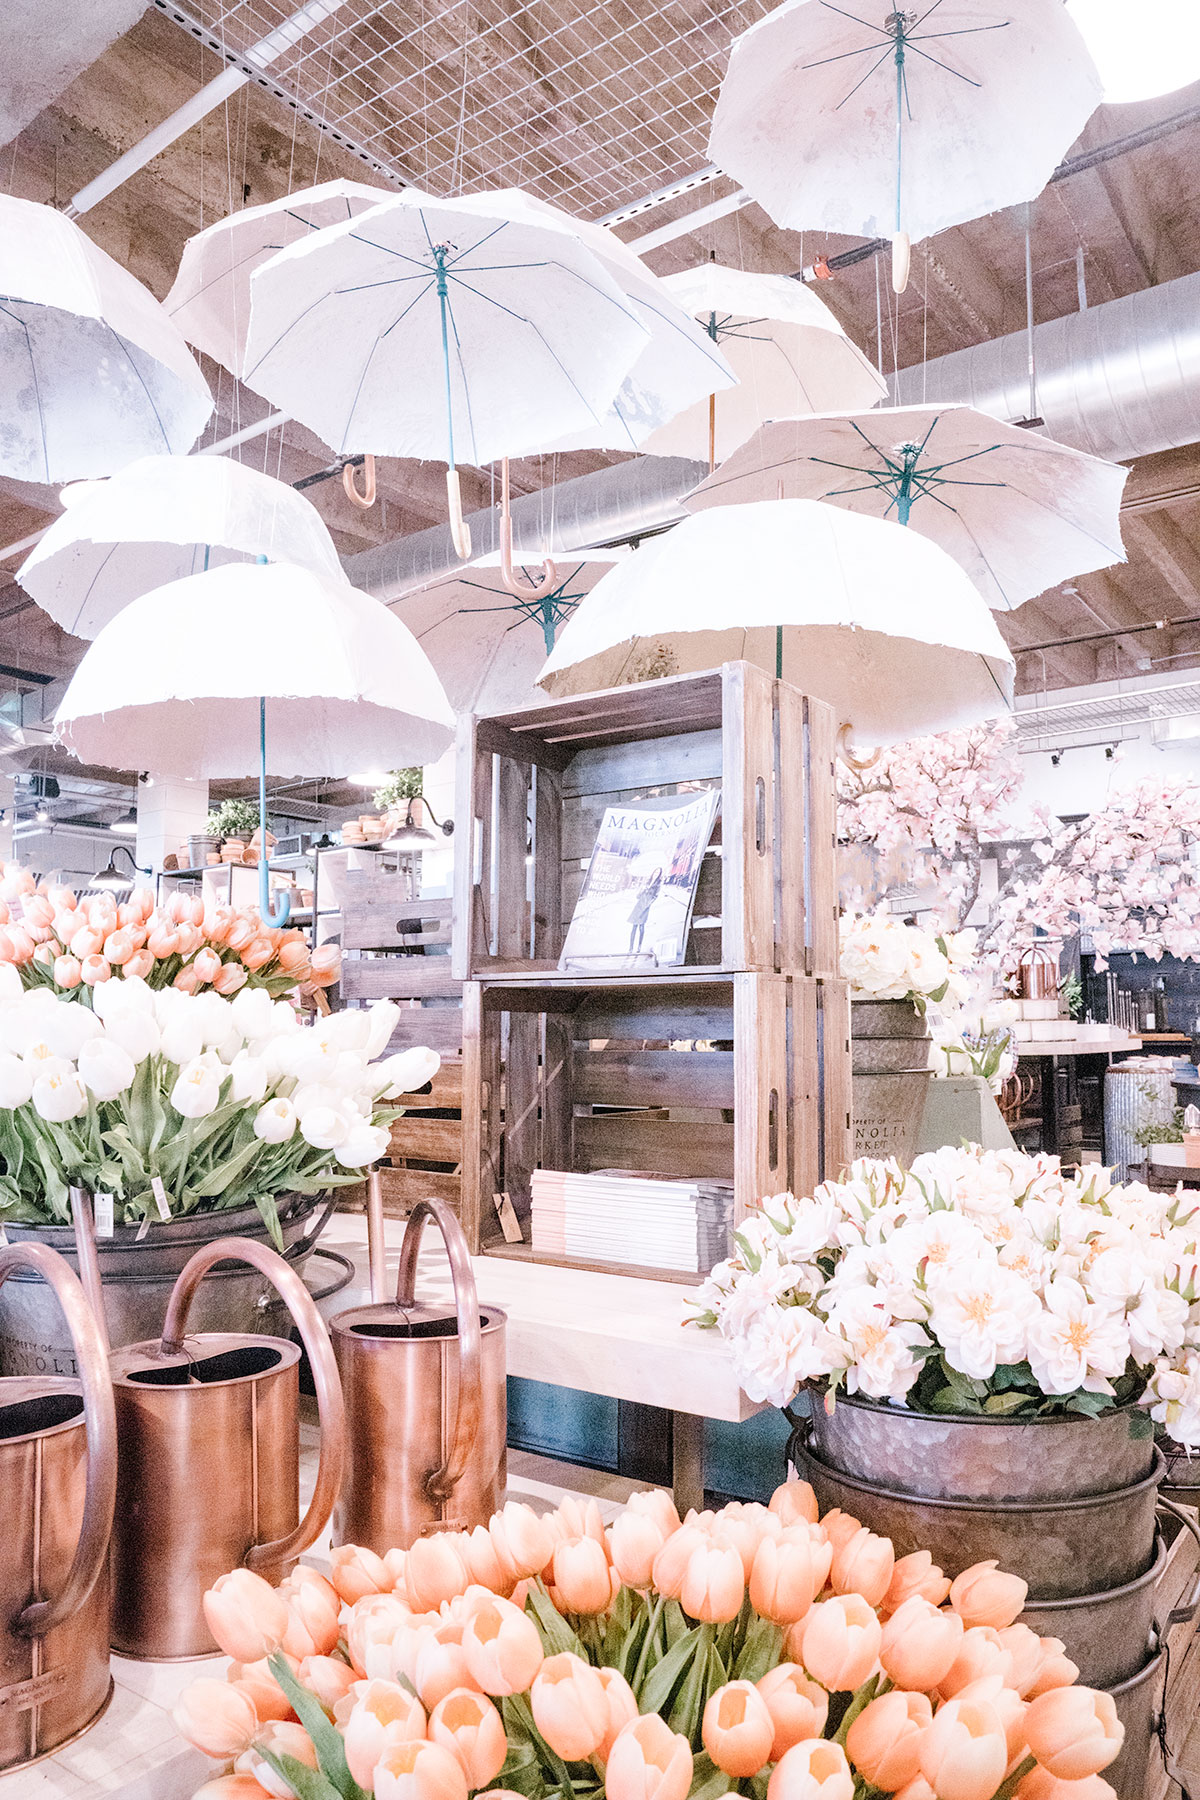 magnolia-market-silos-texas